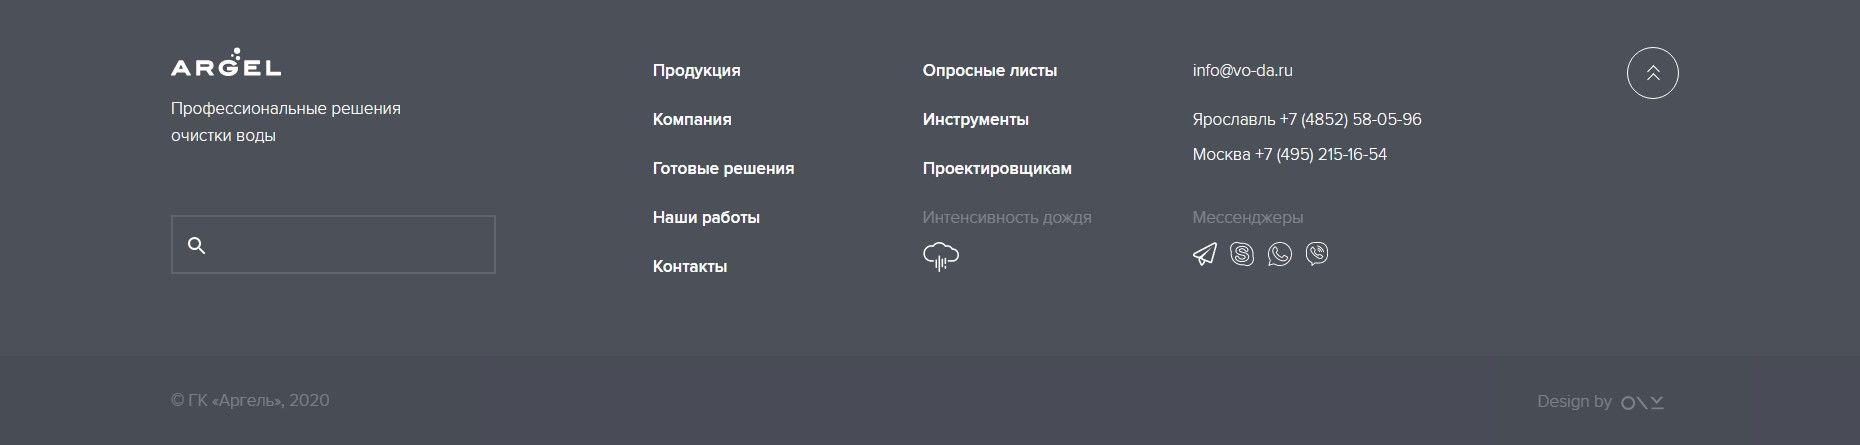 Строка поиска в подвале на примере www.vo-da.ru